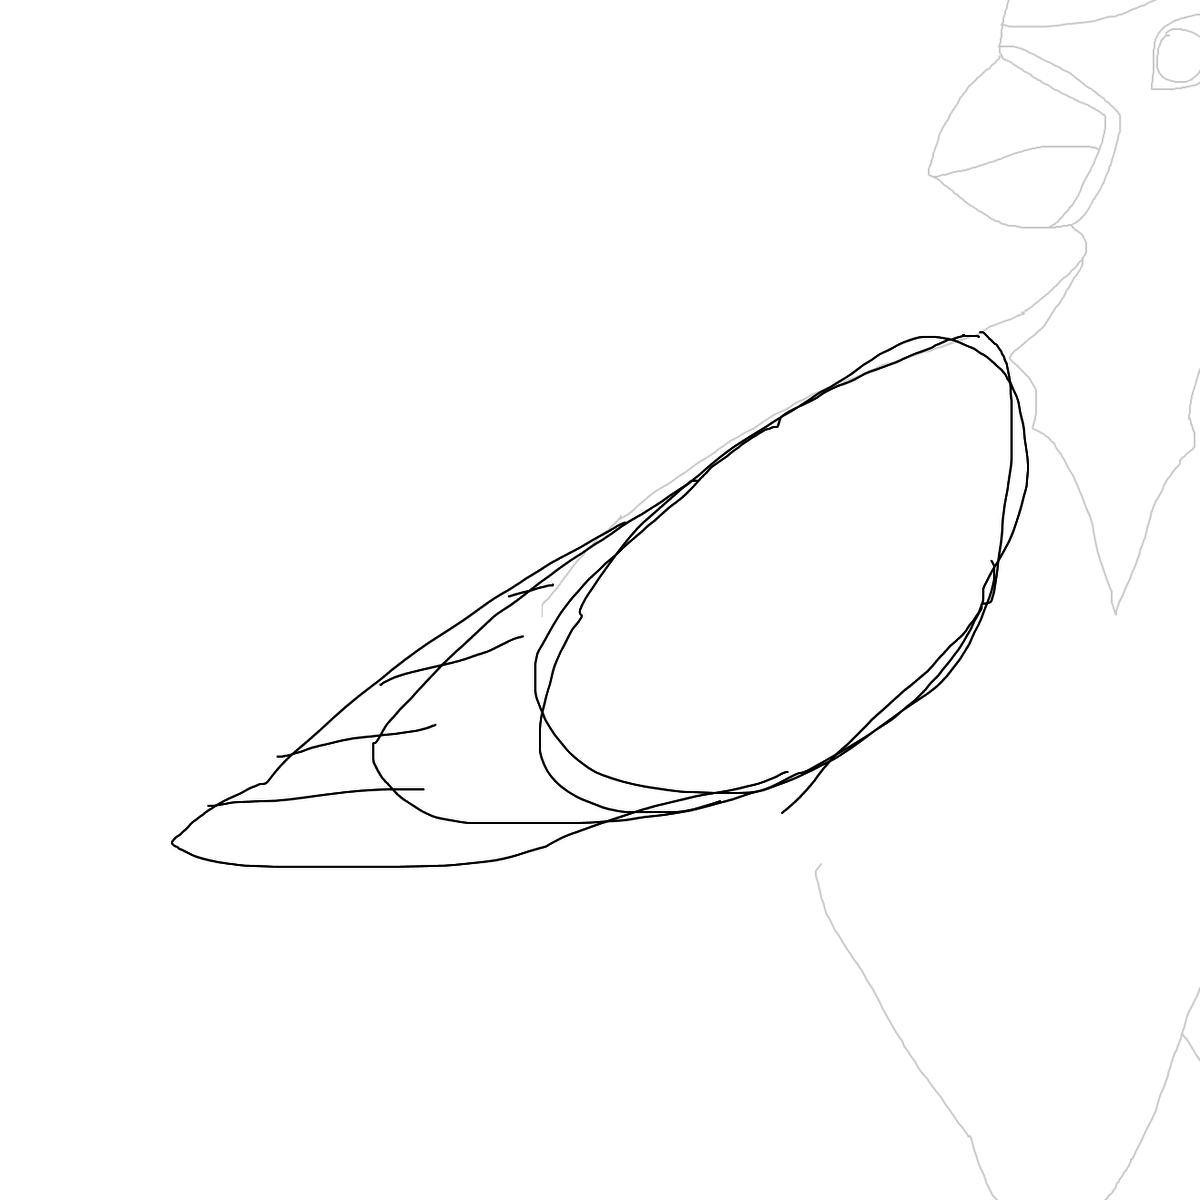 BAAAM drawing#23361 lat:41.9478378295898440lng: -87.6558151245117200